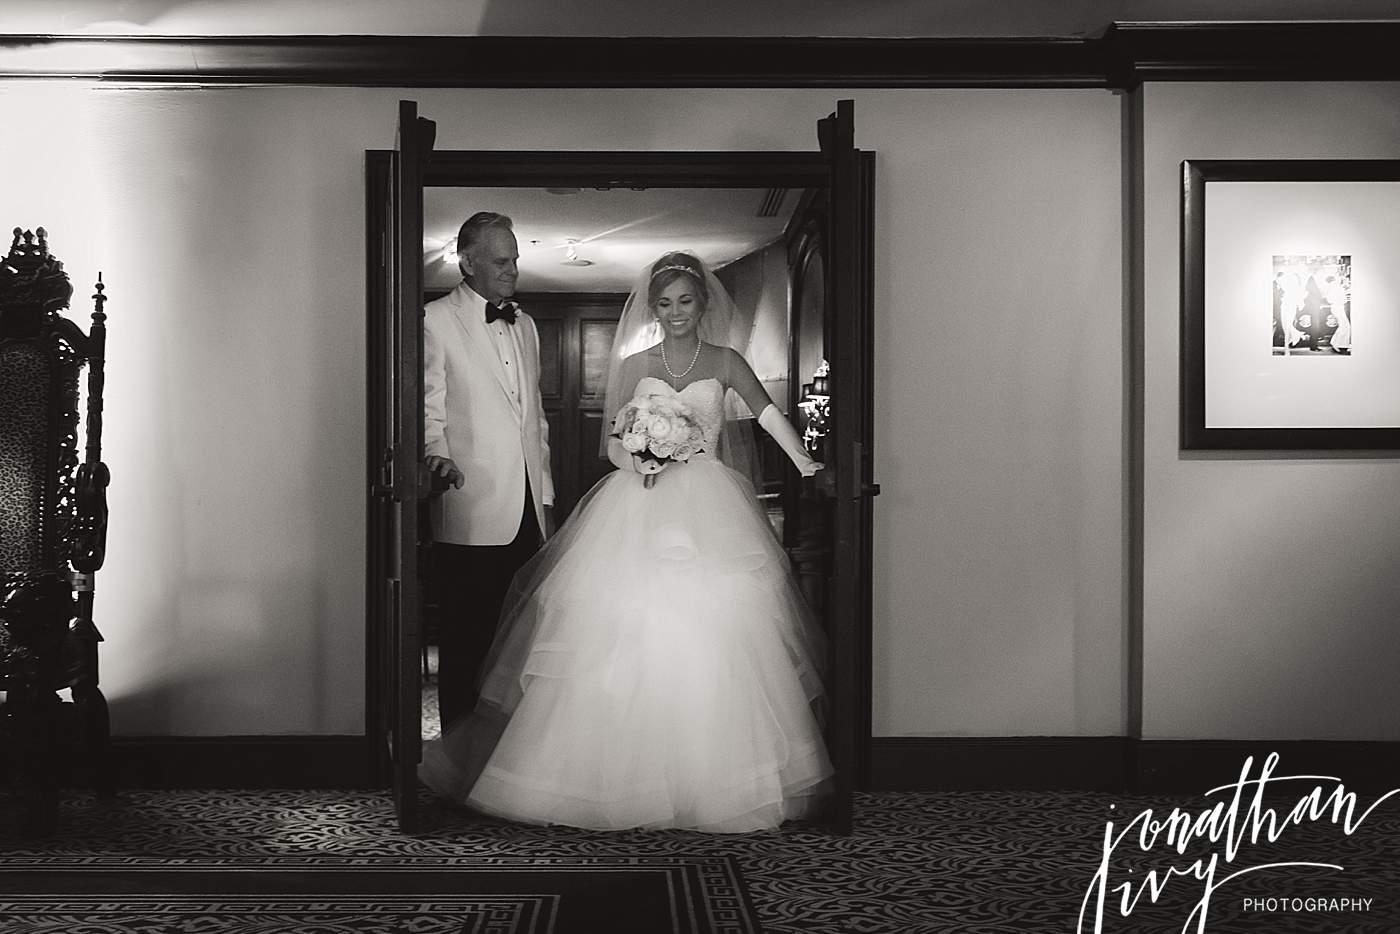 Hotel Zaza Houston,Hotel Zaza Wedding,Houston Wedding Photographer,The Woodlands Wedding Photographer,Wedding at Hotel Zaza,